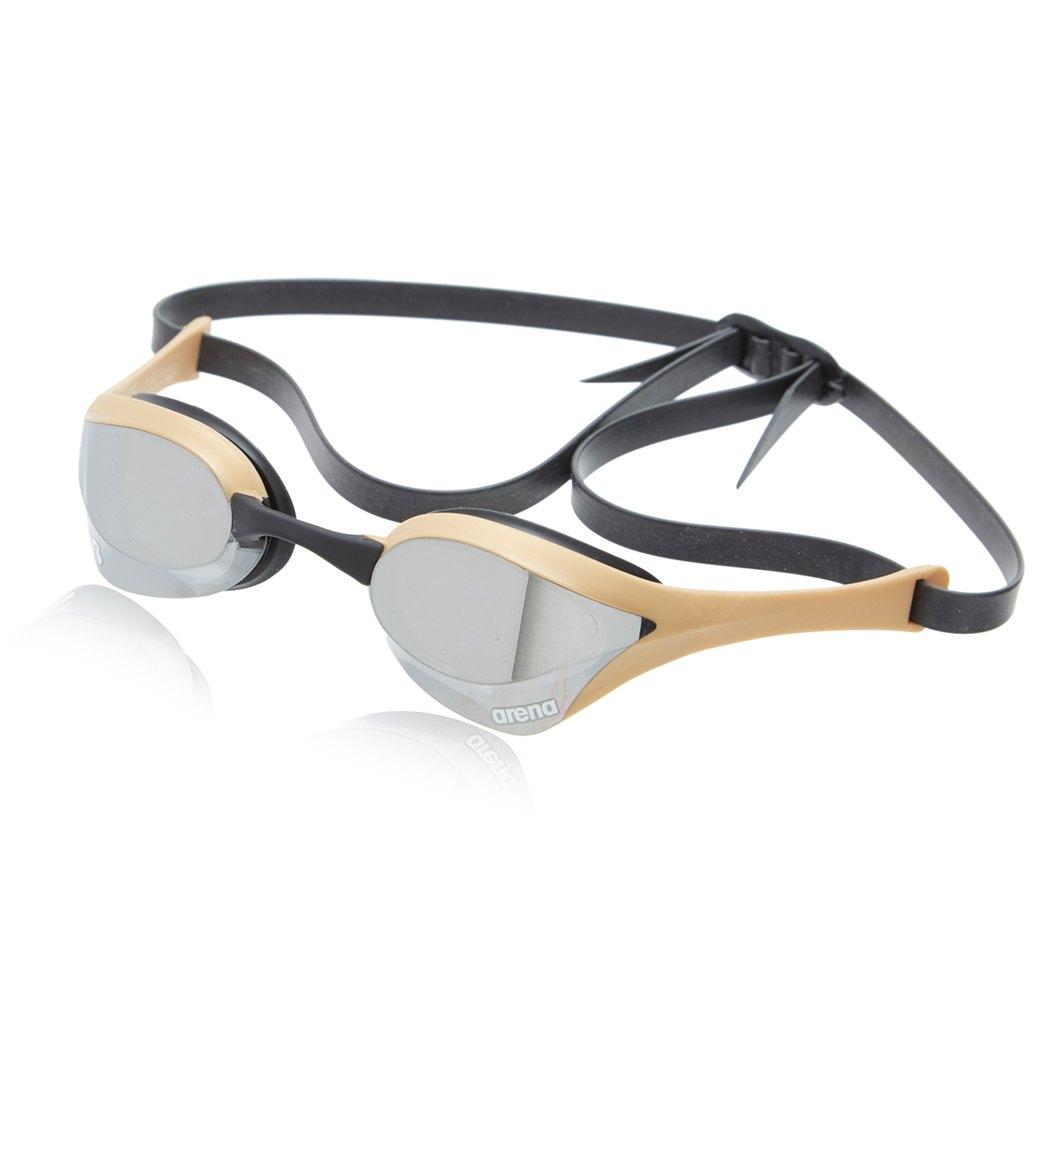 Cobra Ultra Mirror.Details About Arena Cobra Ultra Swipe Mirror Goggle